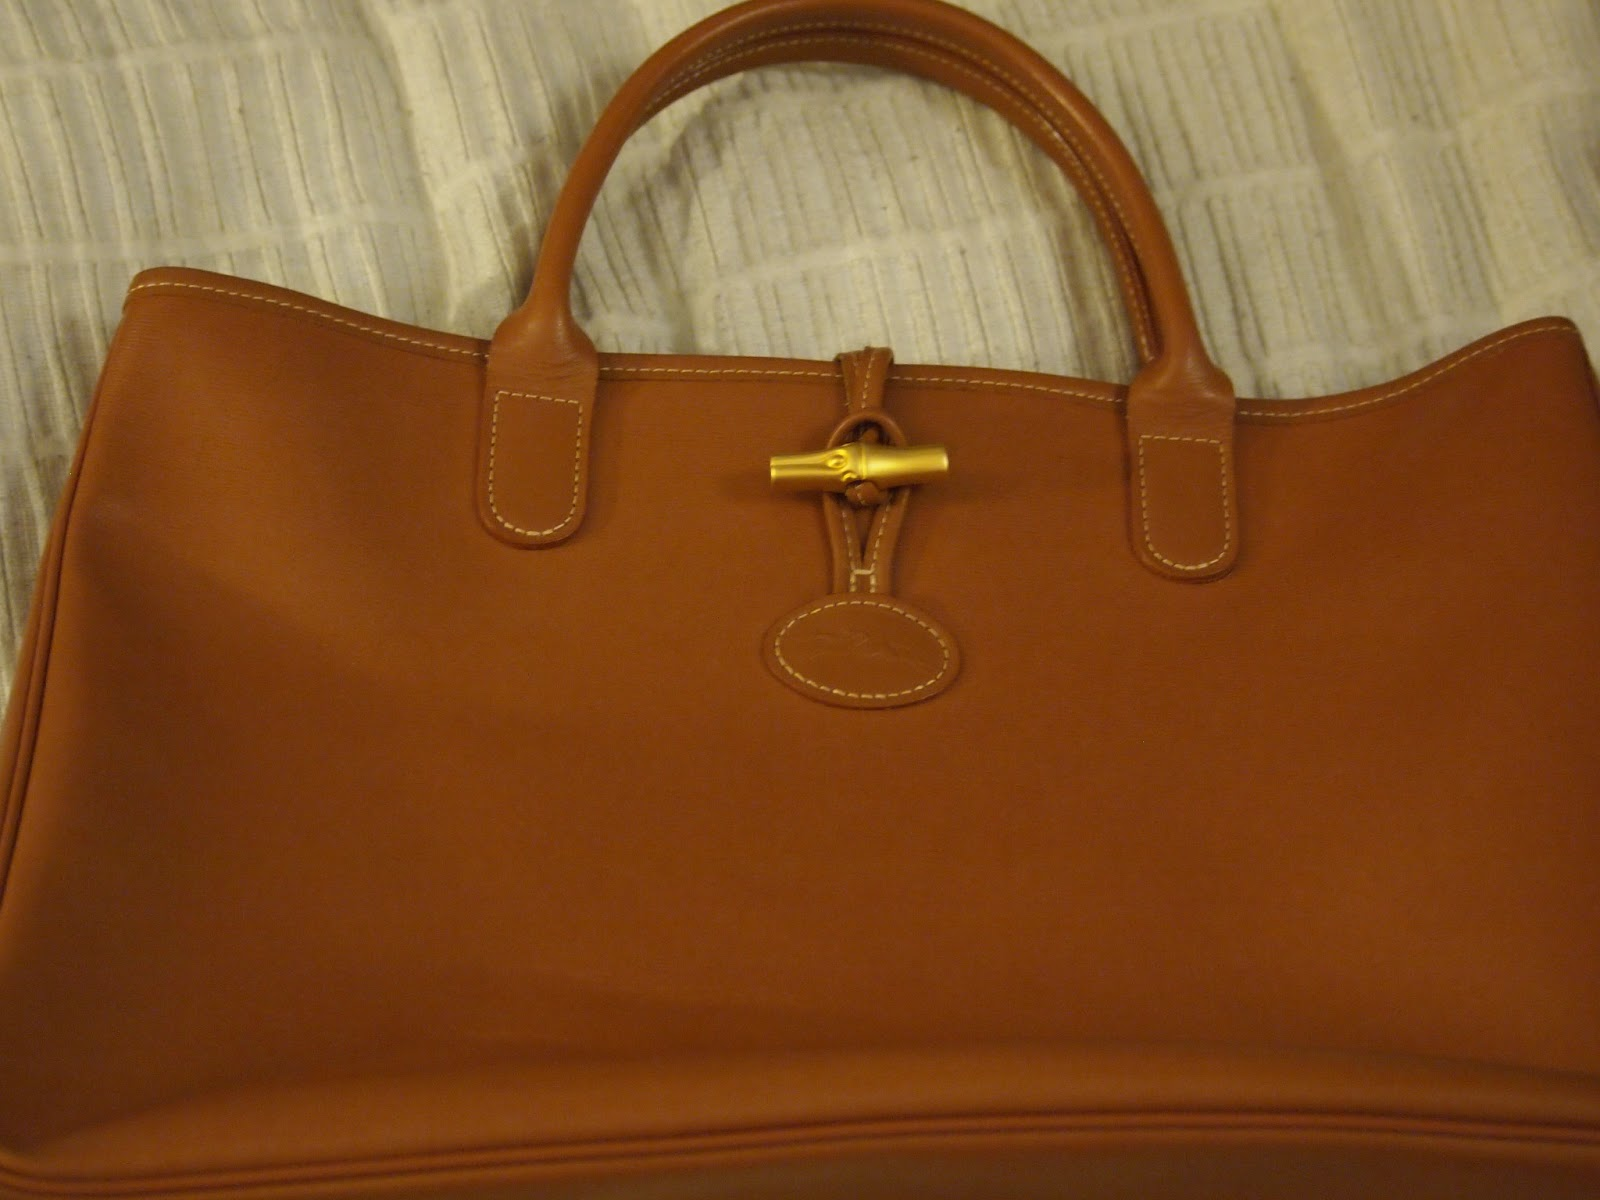 Nahkaiset Longchamp Laukut : Xl el?m?? longchamp roseau